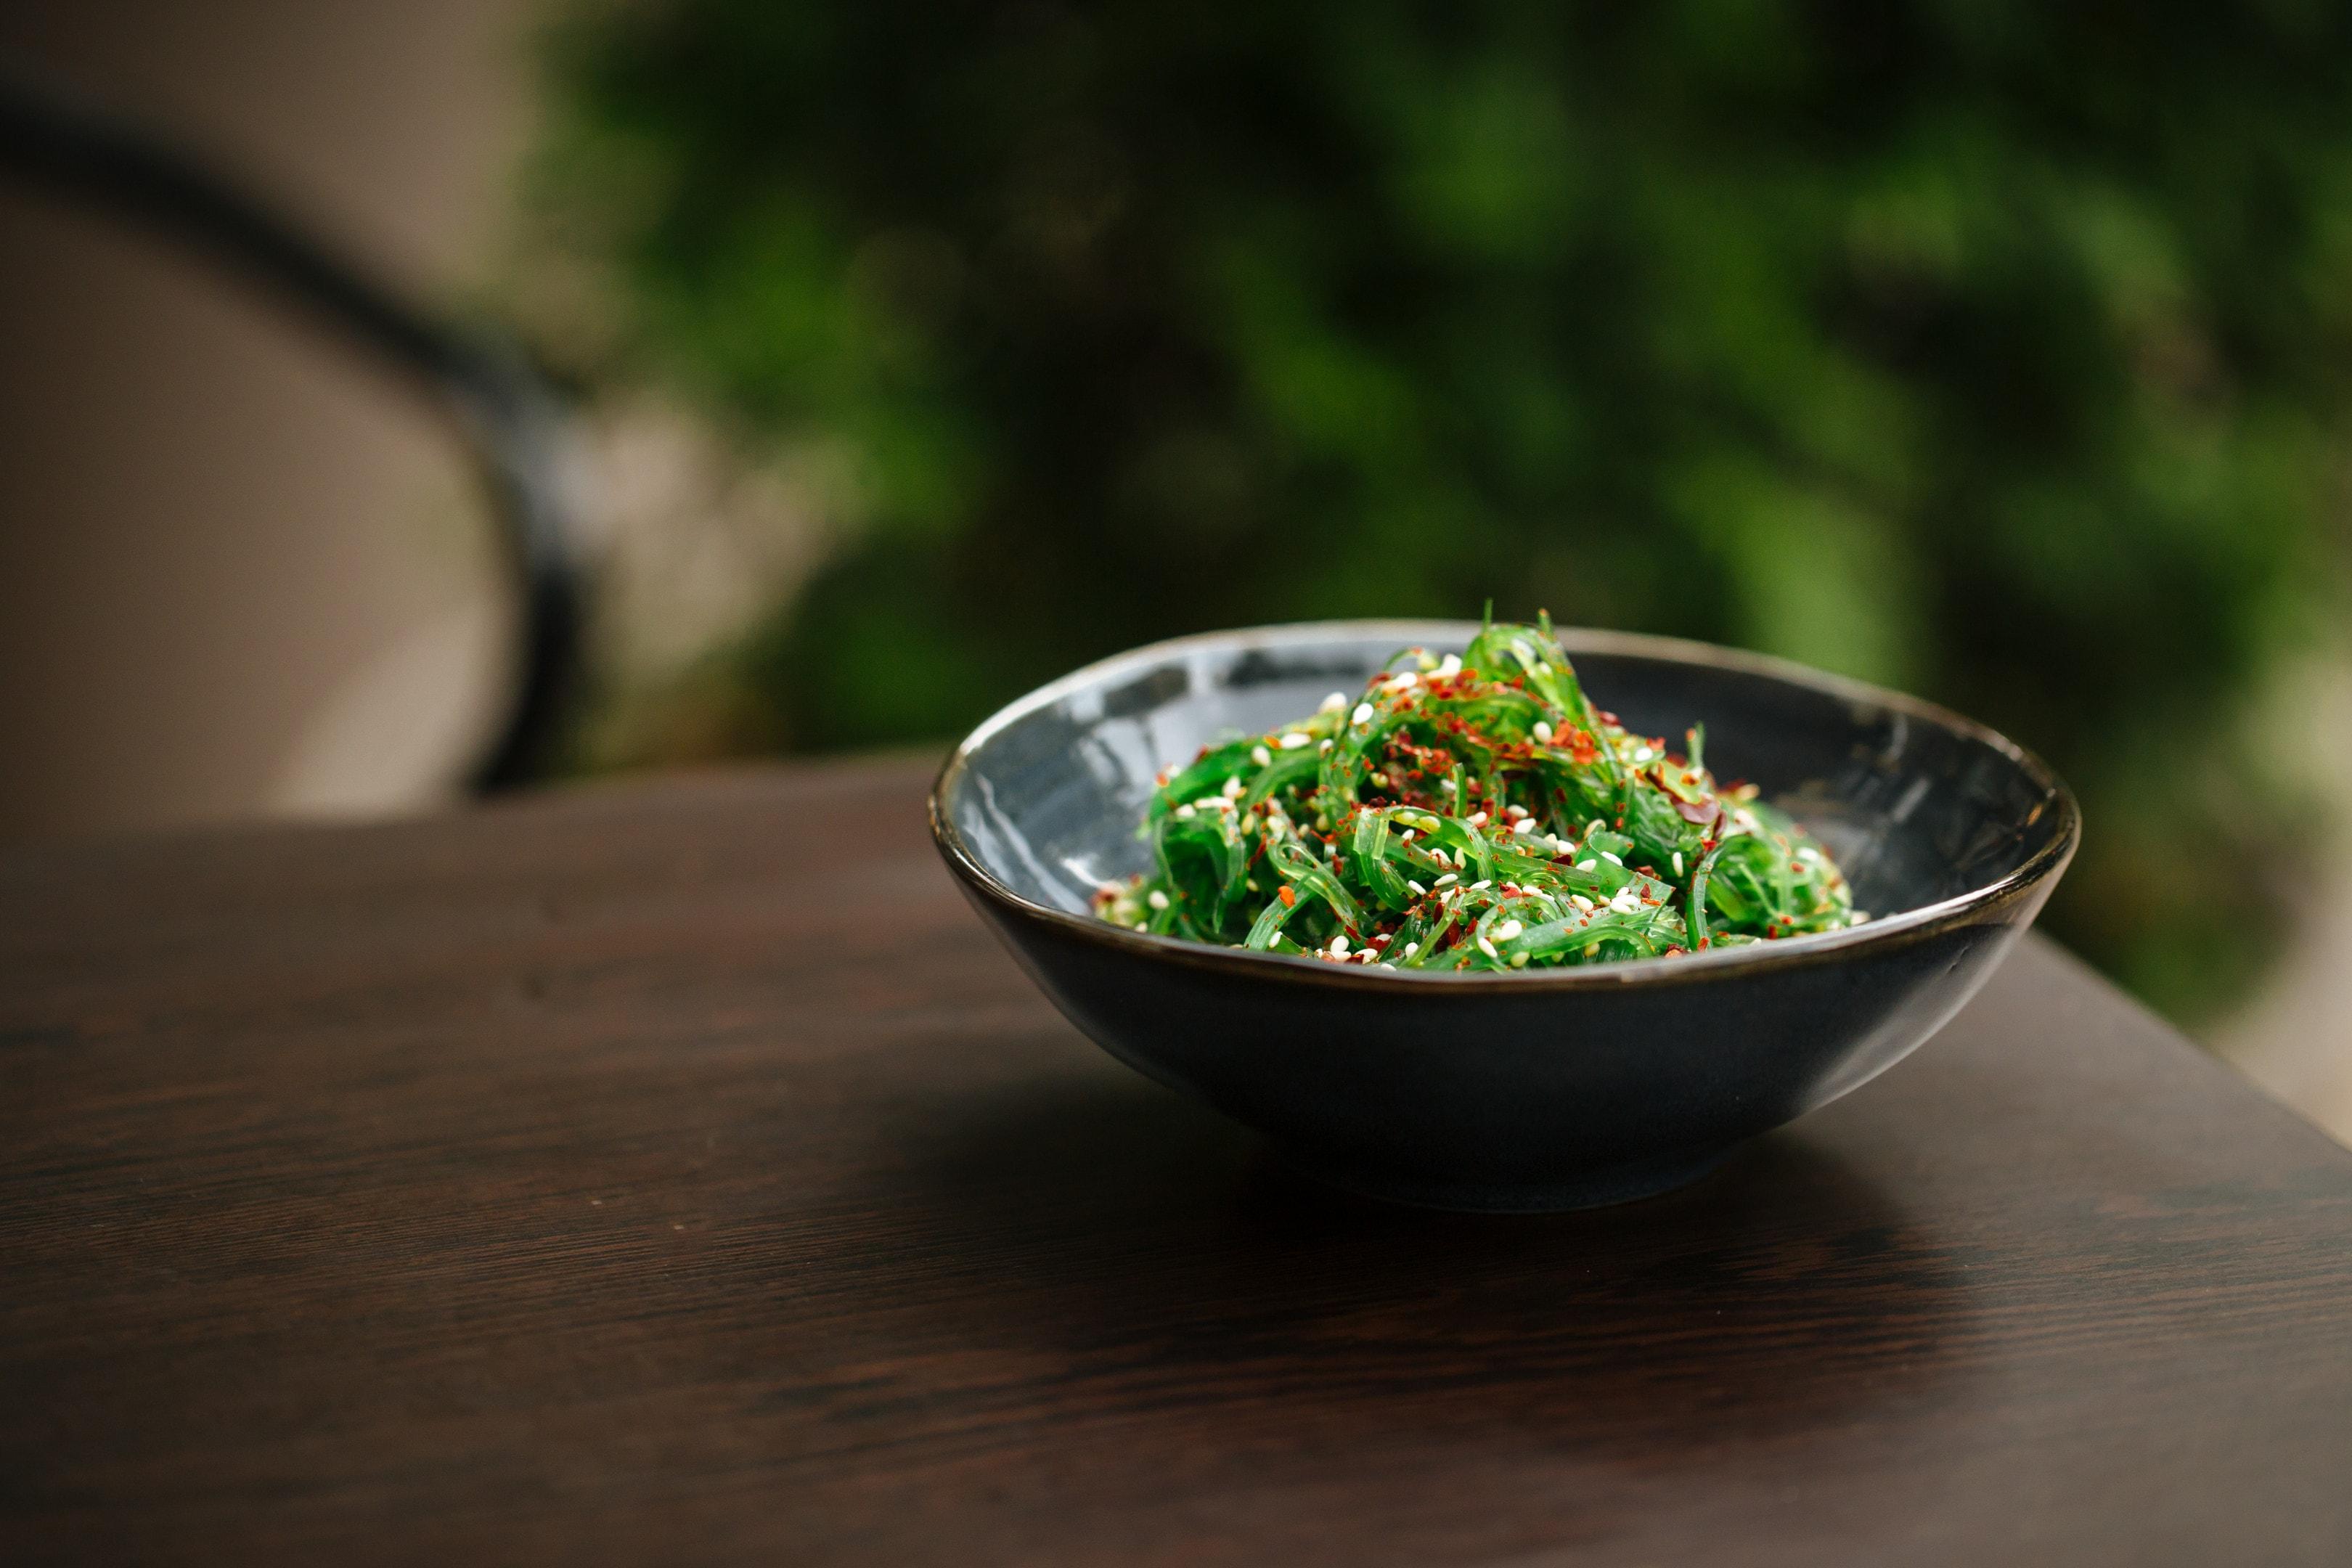 Green chuka seaweed salad in black bowl